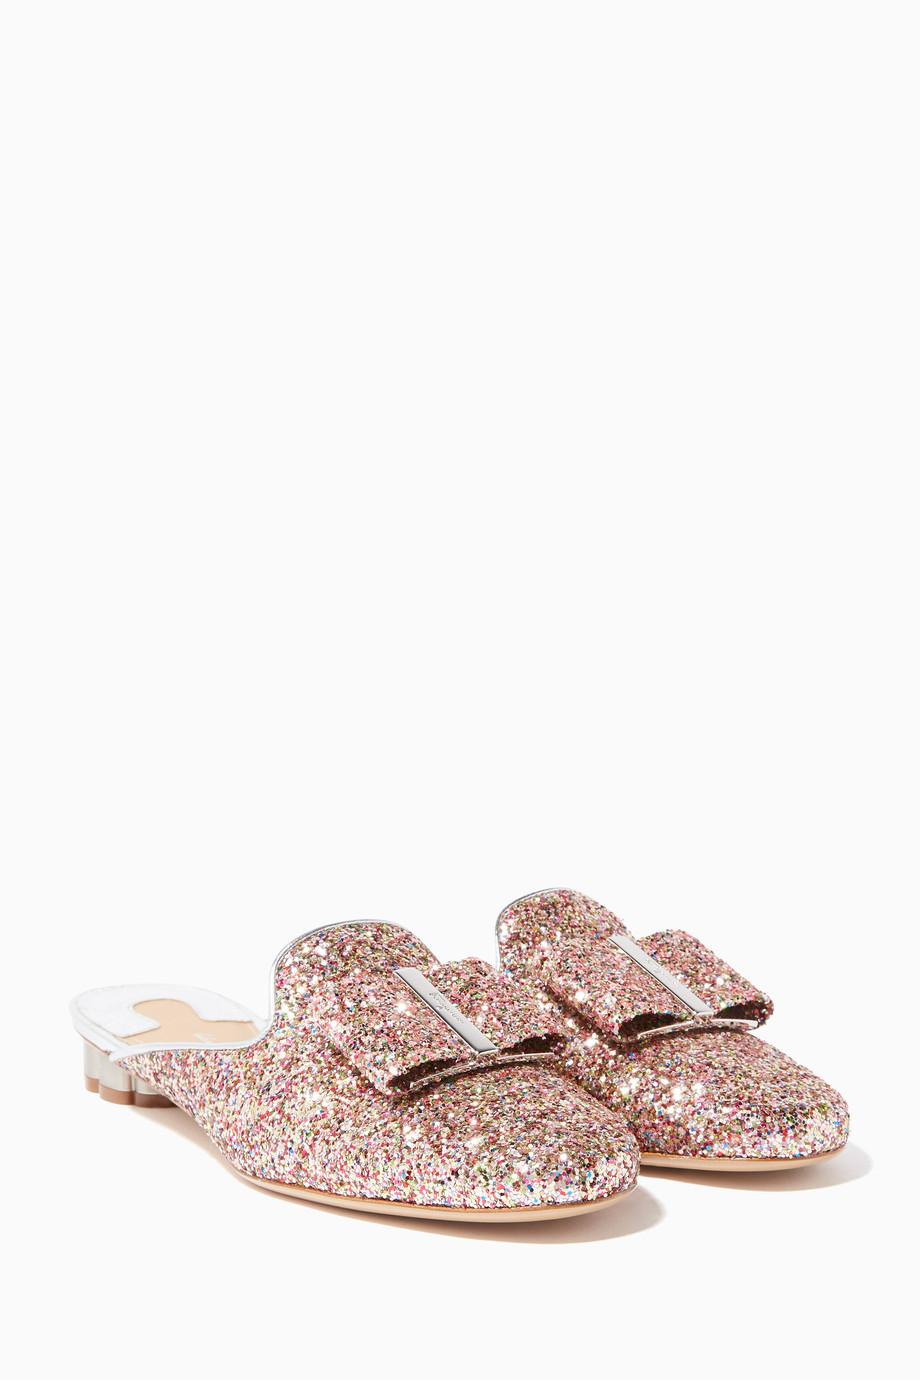 28a2faf9f51378 Shop Salvatore Ferragamo Pink Pink Glitter Flower-Heel Mule Slippers ...